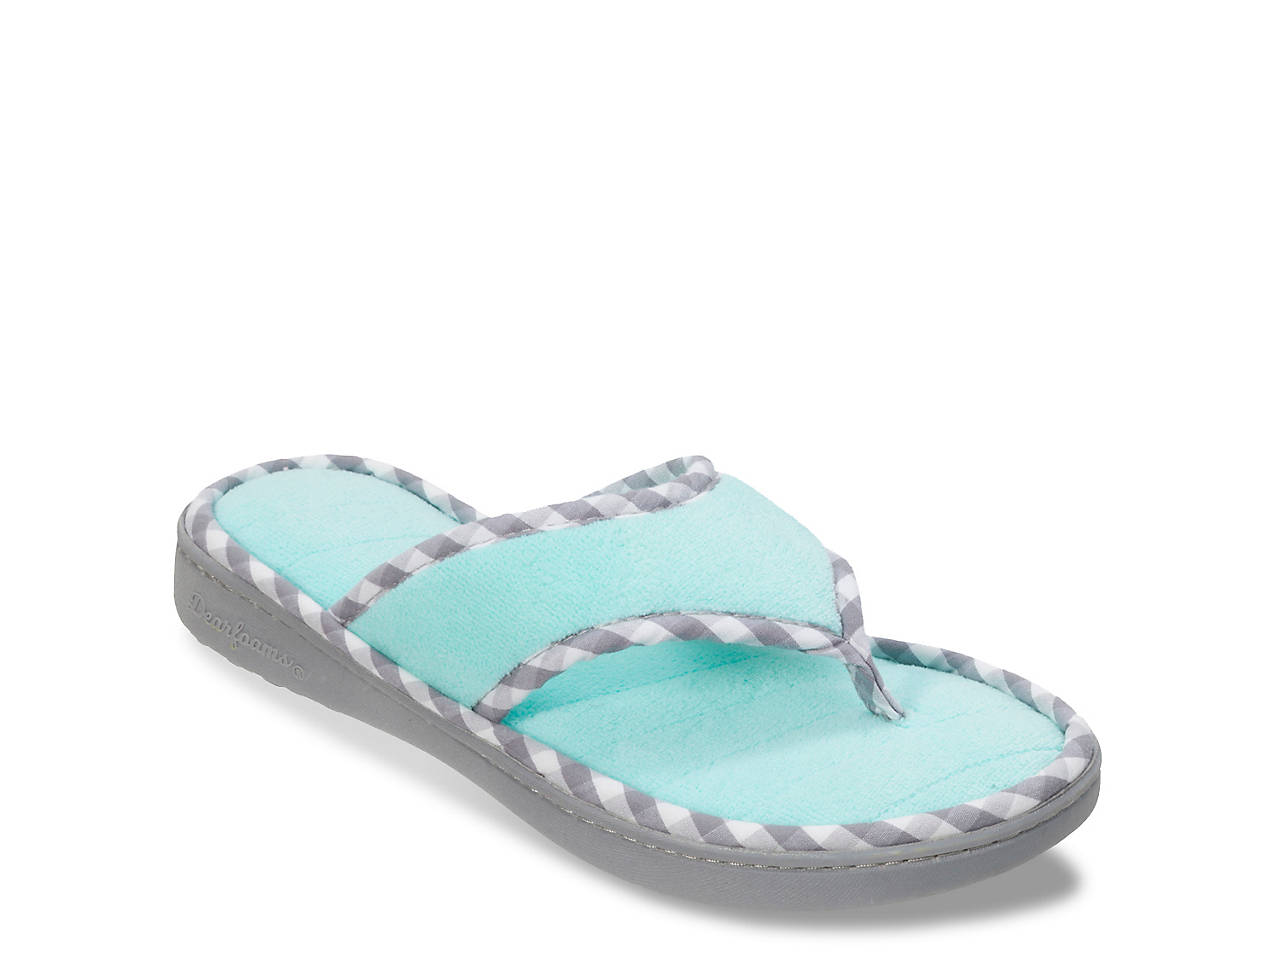 edf70968391 Dearfoams Terry Thong Slipper Women s Shoes